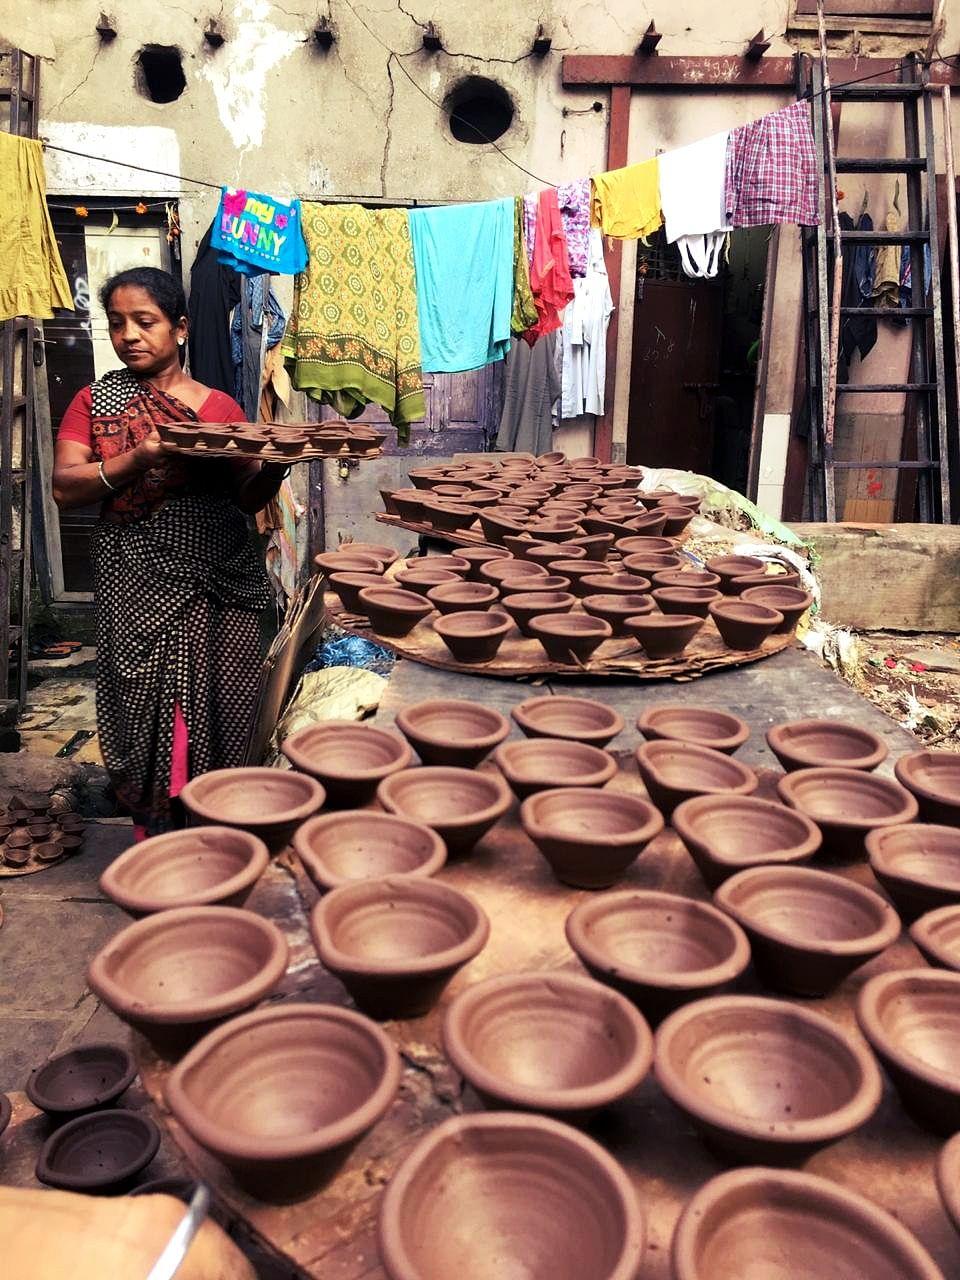 Pramila Parma lays out clay diyas to dry in Dharavi's Kumbharwada. (Source: BloombergQuint)